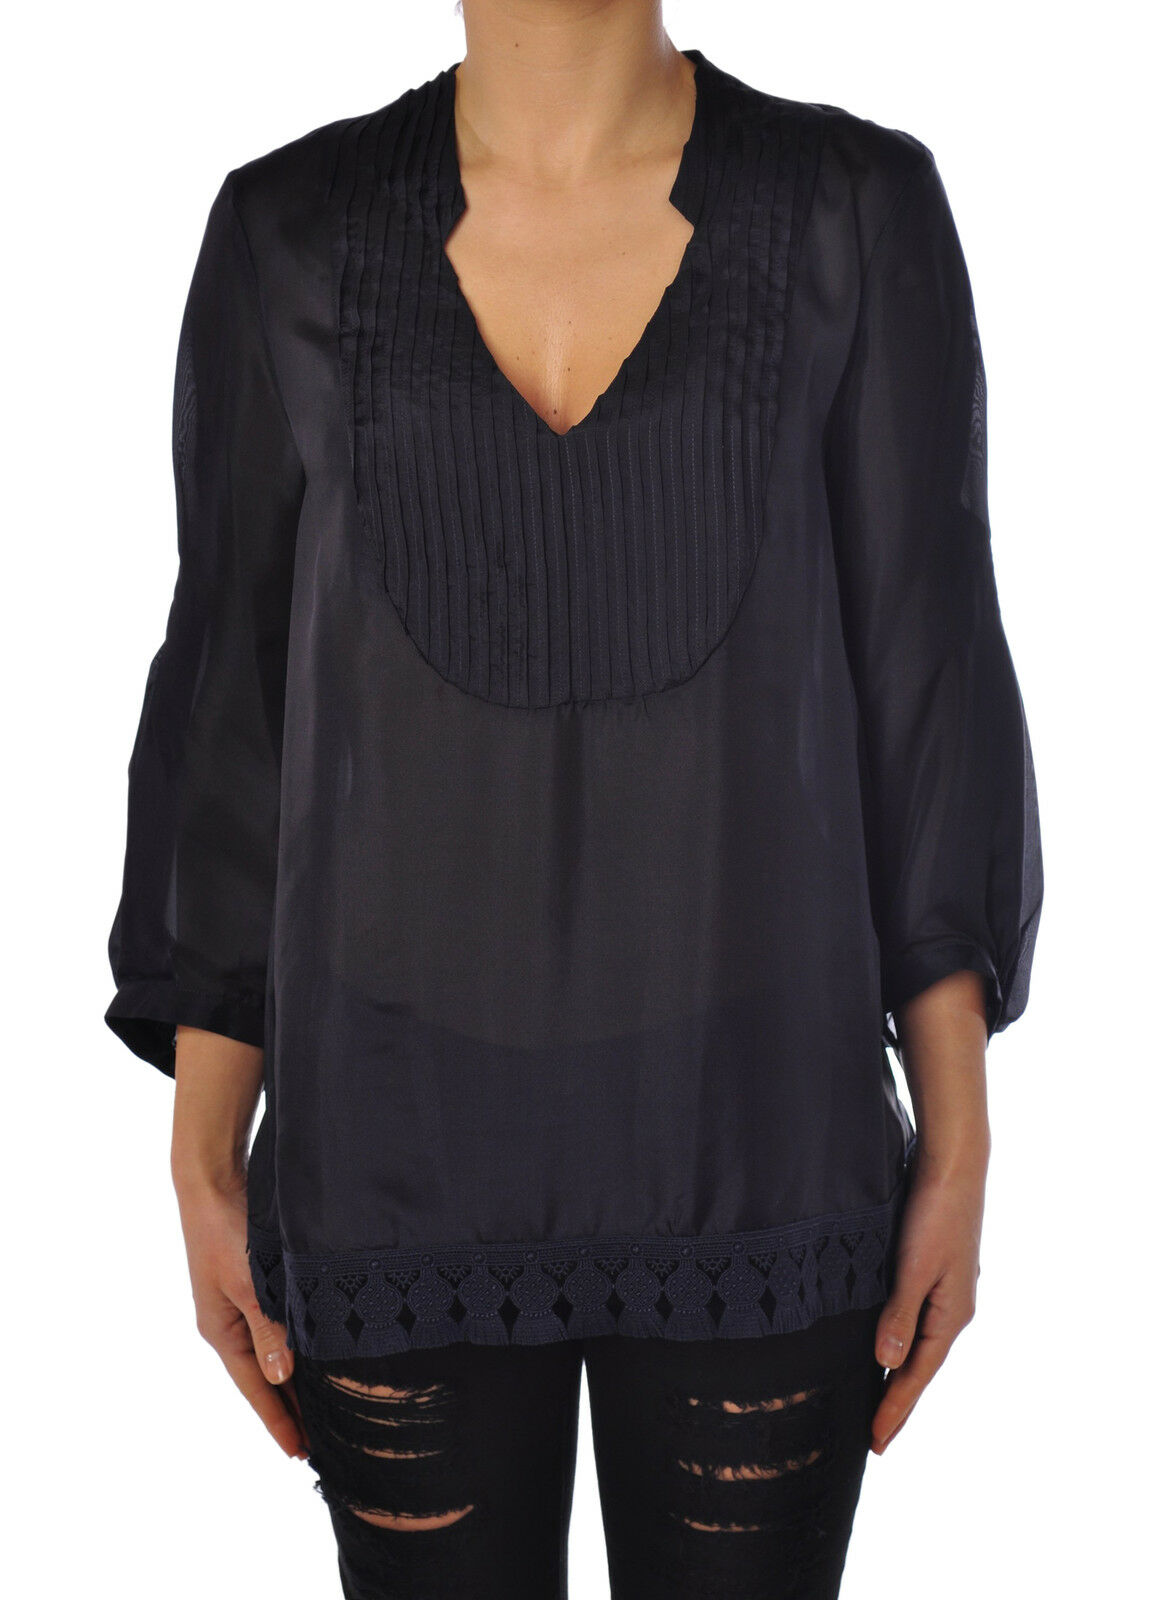 Dondup-Camisa-Mujer  - 42-Azul - 1711914c165806  gran descuento